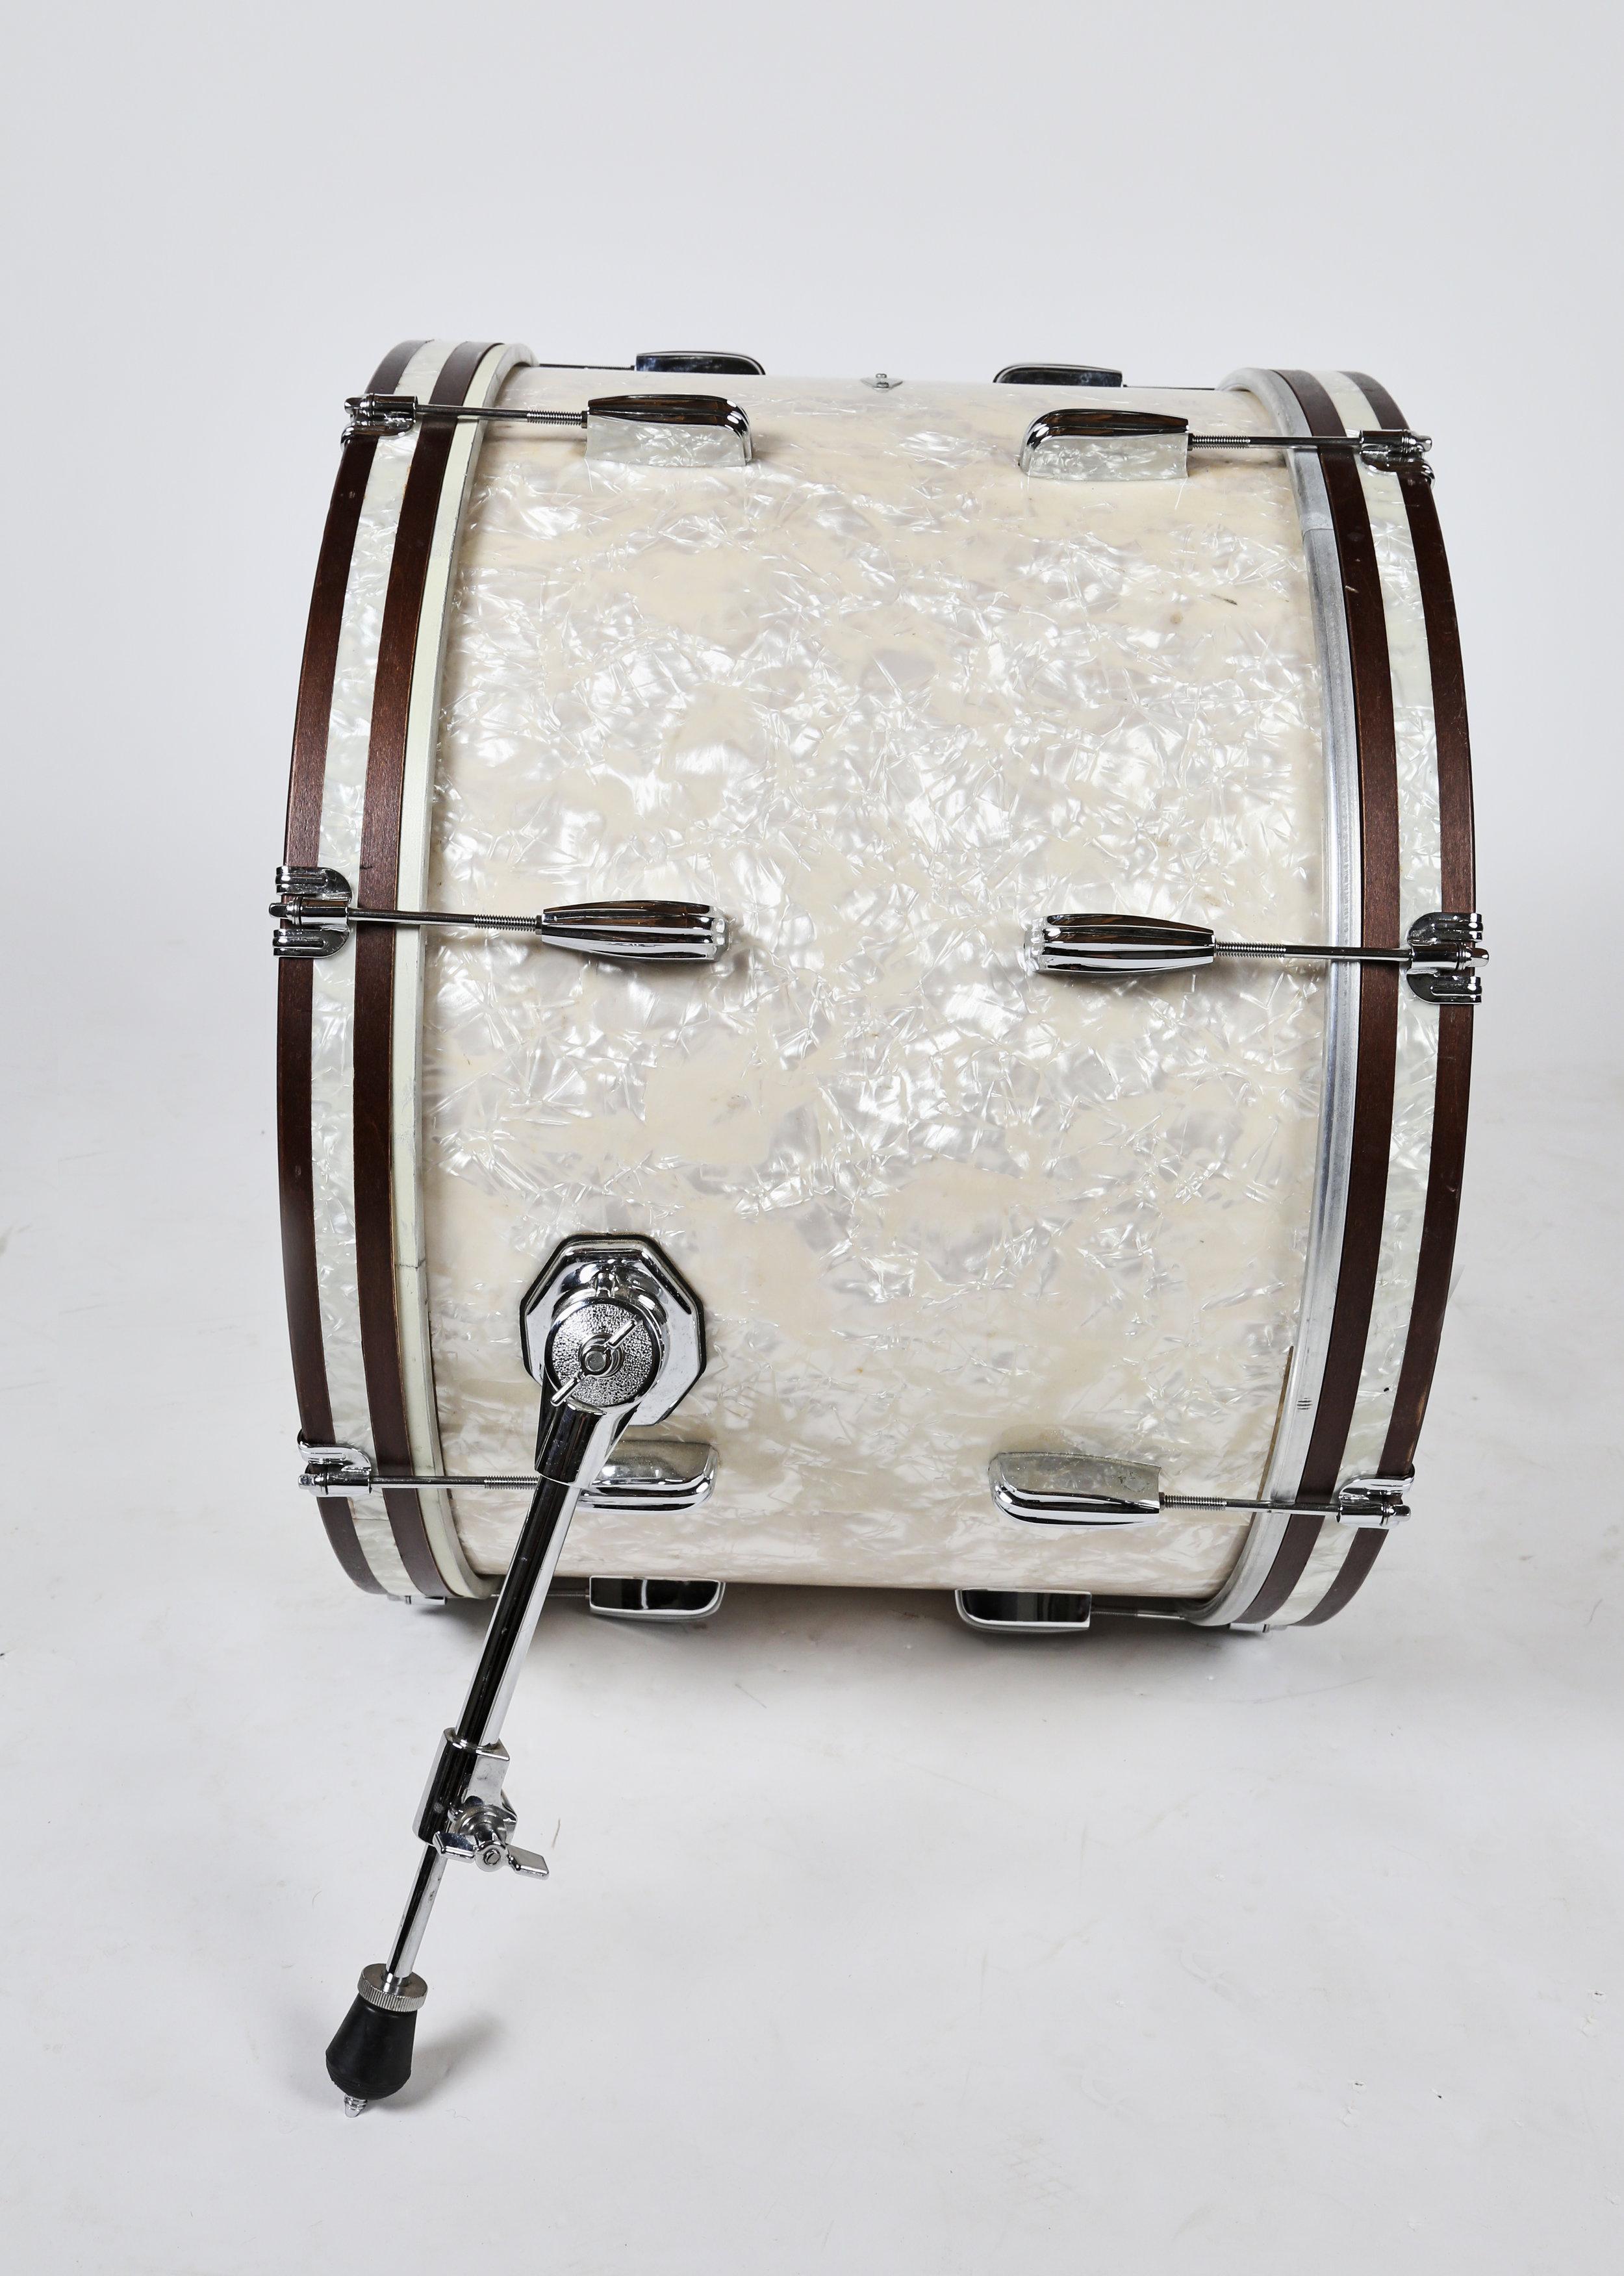 Dorio Vintage Drum_C&C Big Red_1922.jpg